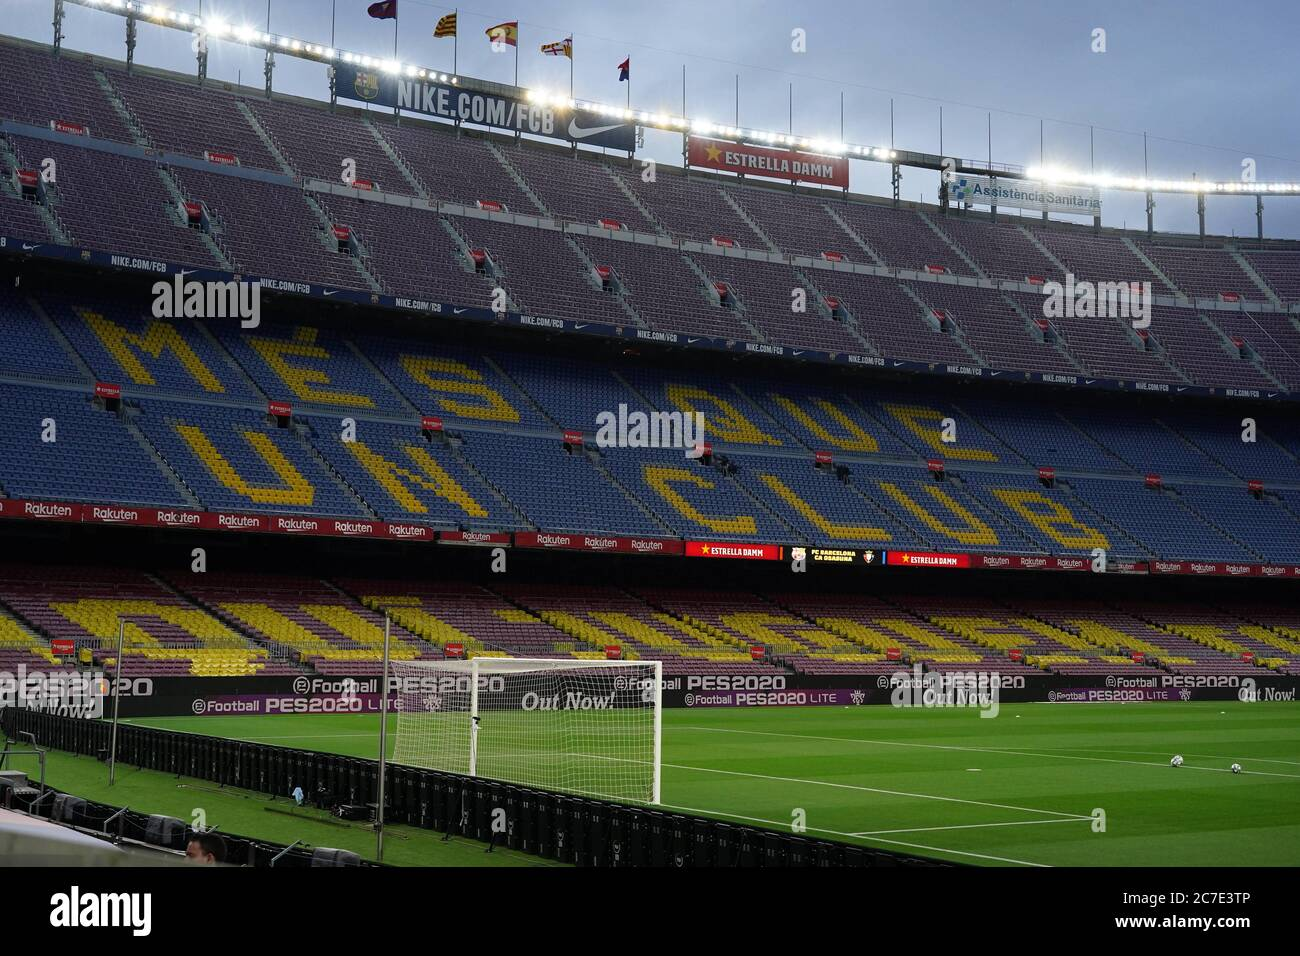 barcelona spain 16th july 2020 spanish la liga soccer match fc barcelona vs osasuna at camp alamy